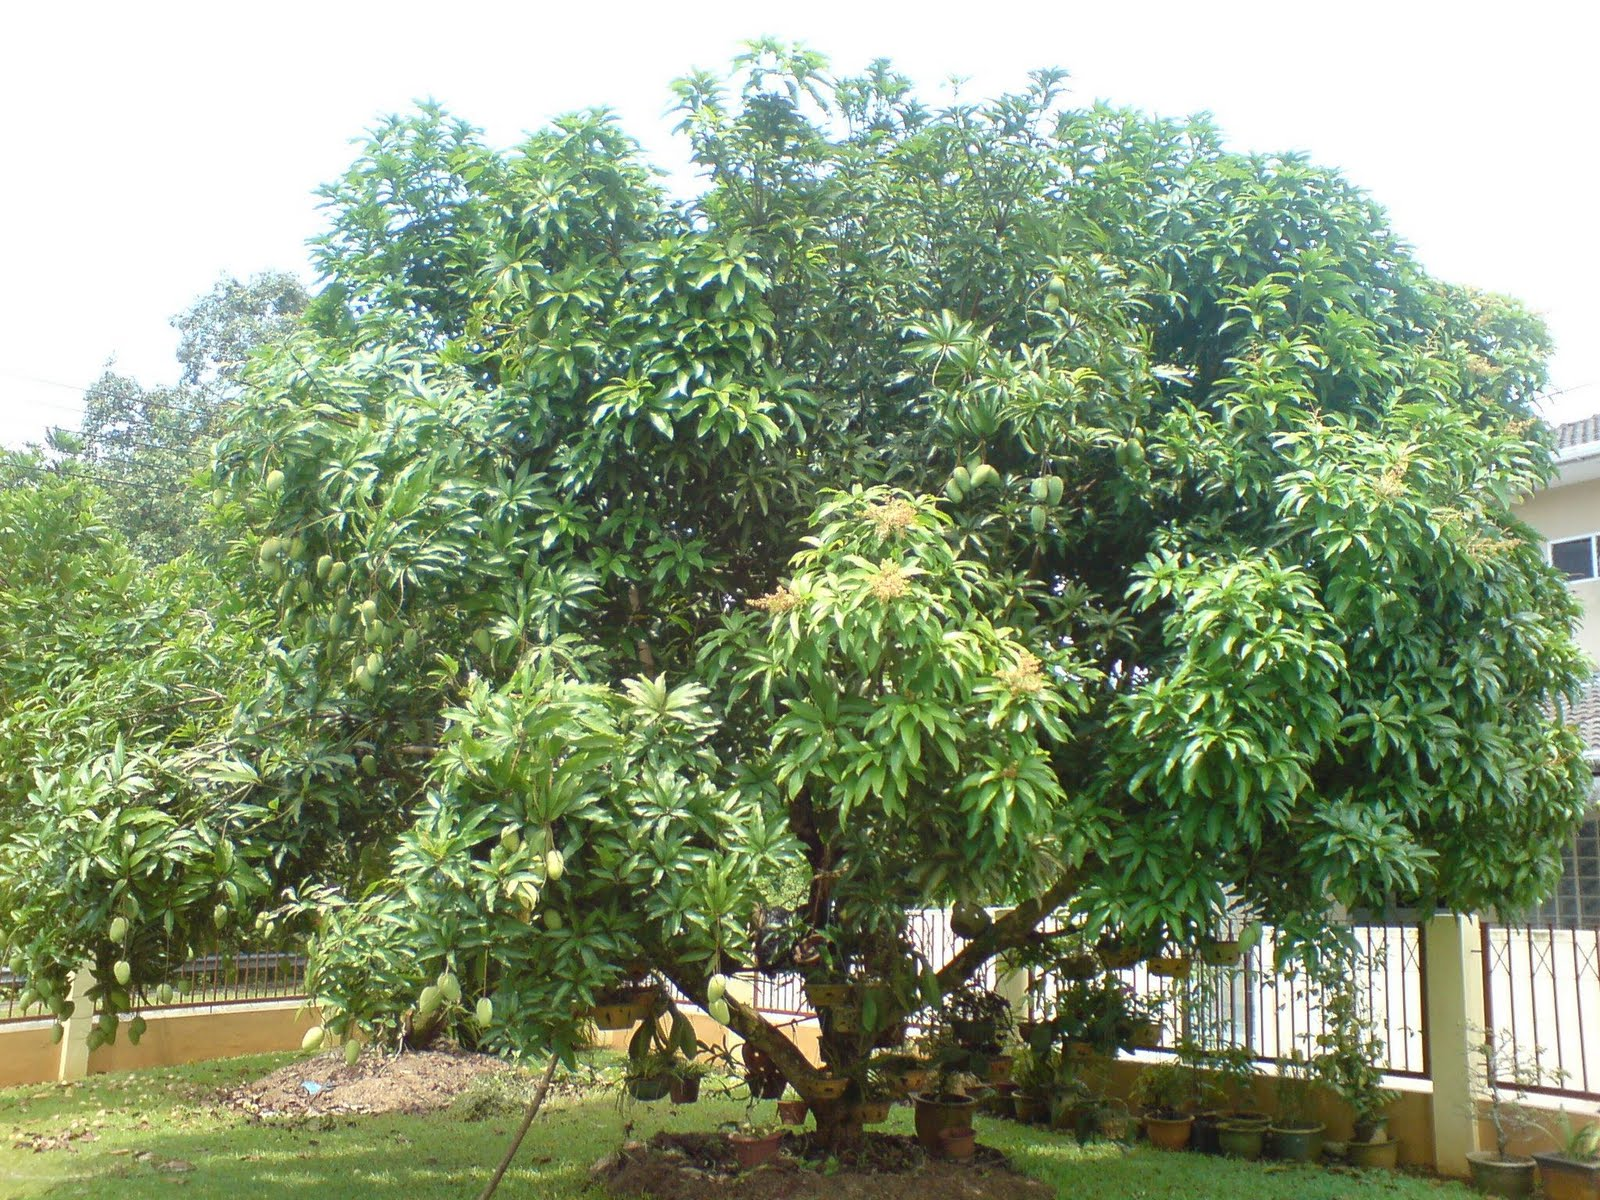 tree mangifera indica mango tree mangifera indica mango tree mangifera